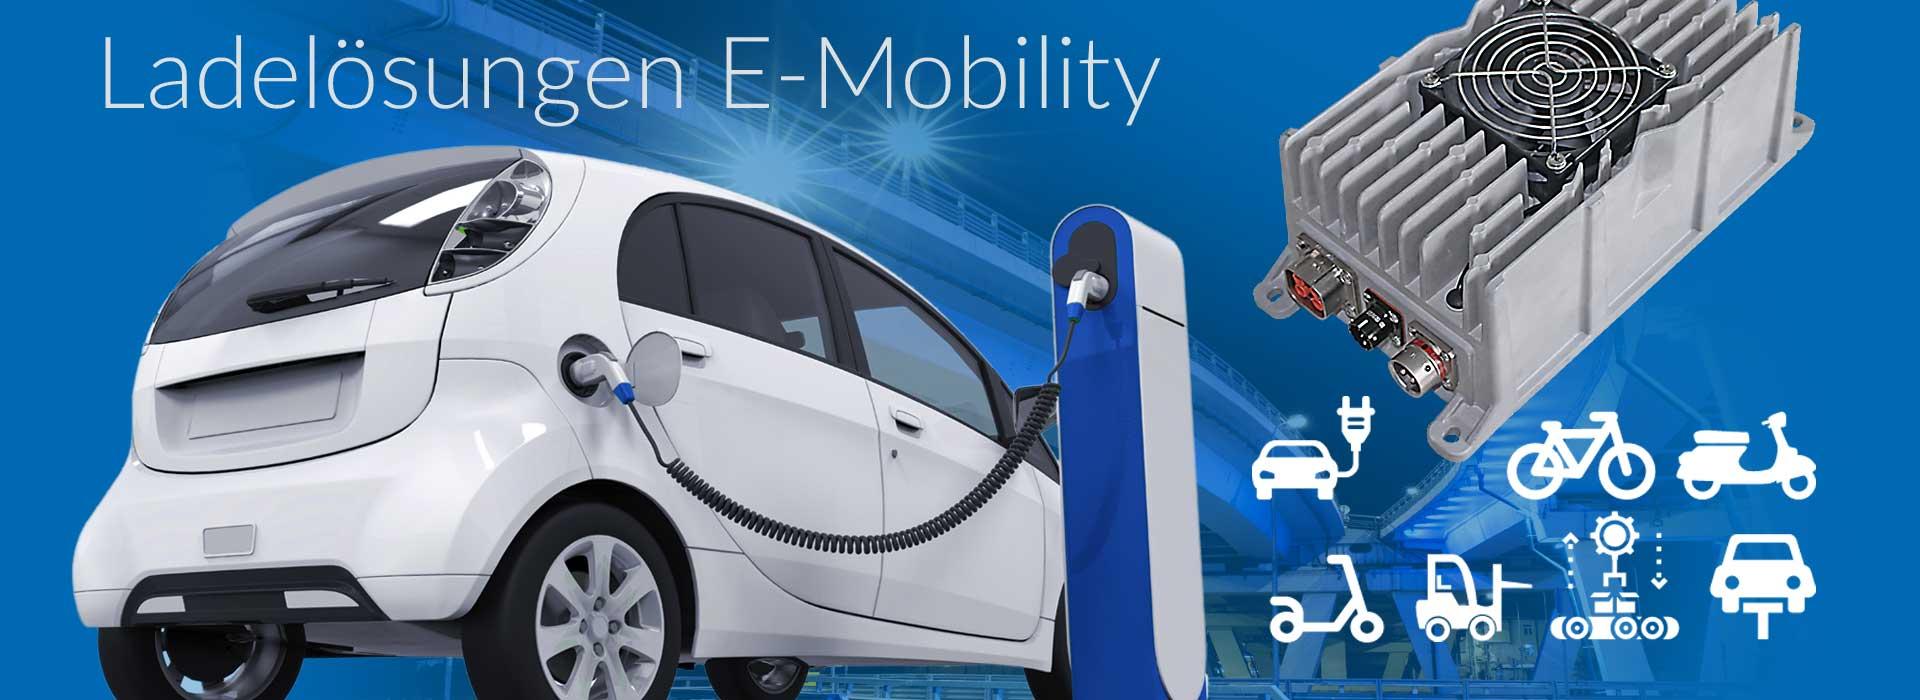 e-mobiliy-elektro-mobilitaet-lader